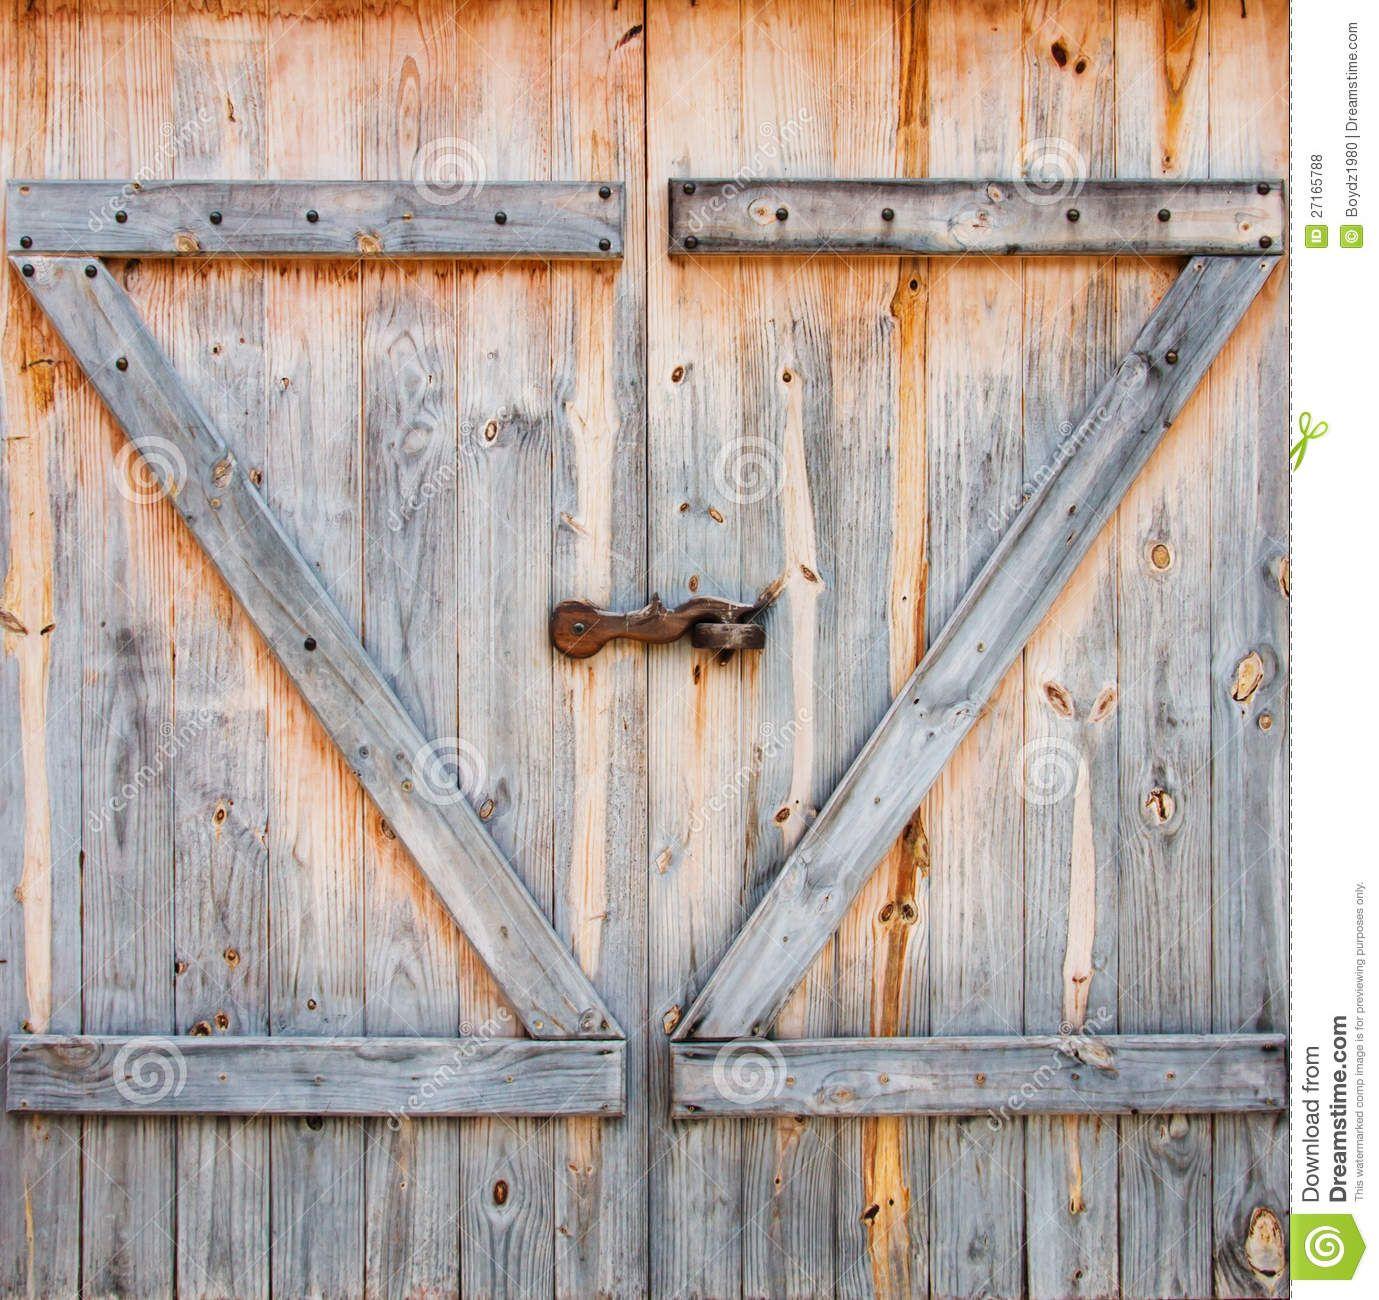 Barn Door 27165788 Jpg 1379 1300 Stallturen Wohnzimmer Dekor Rustikal Rustikale Vorhange